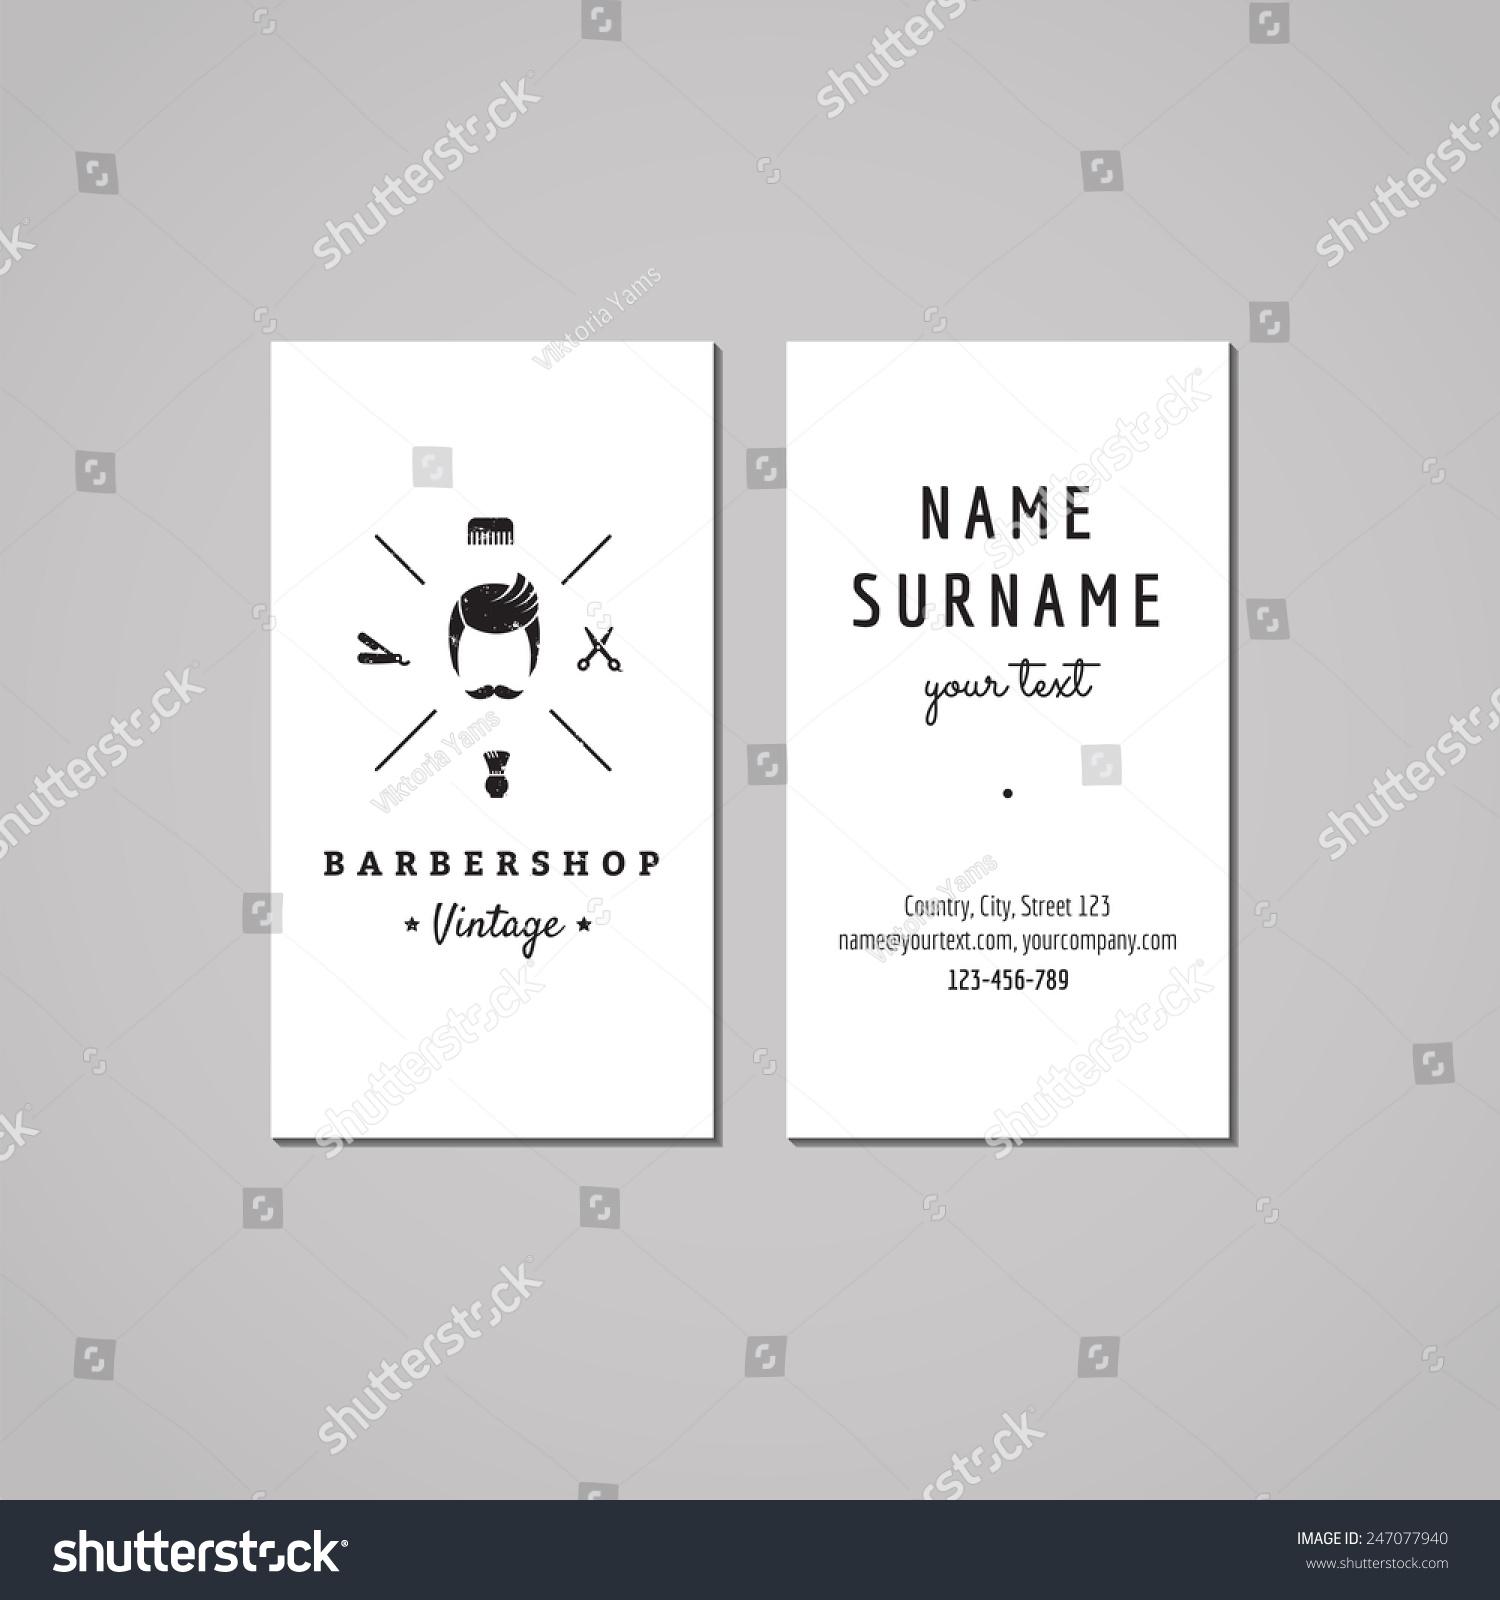 Barbershop Hair Salon Business Card Design Stock Vector (2018 ...